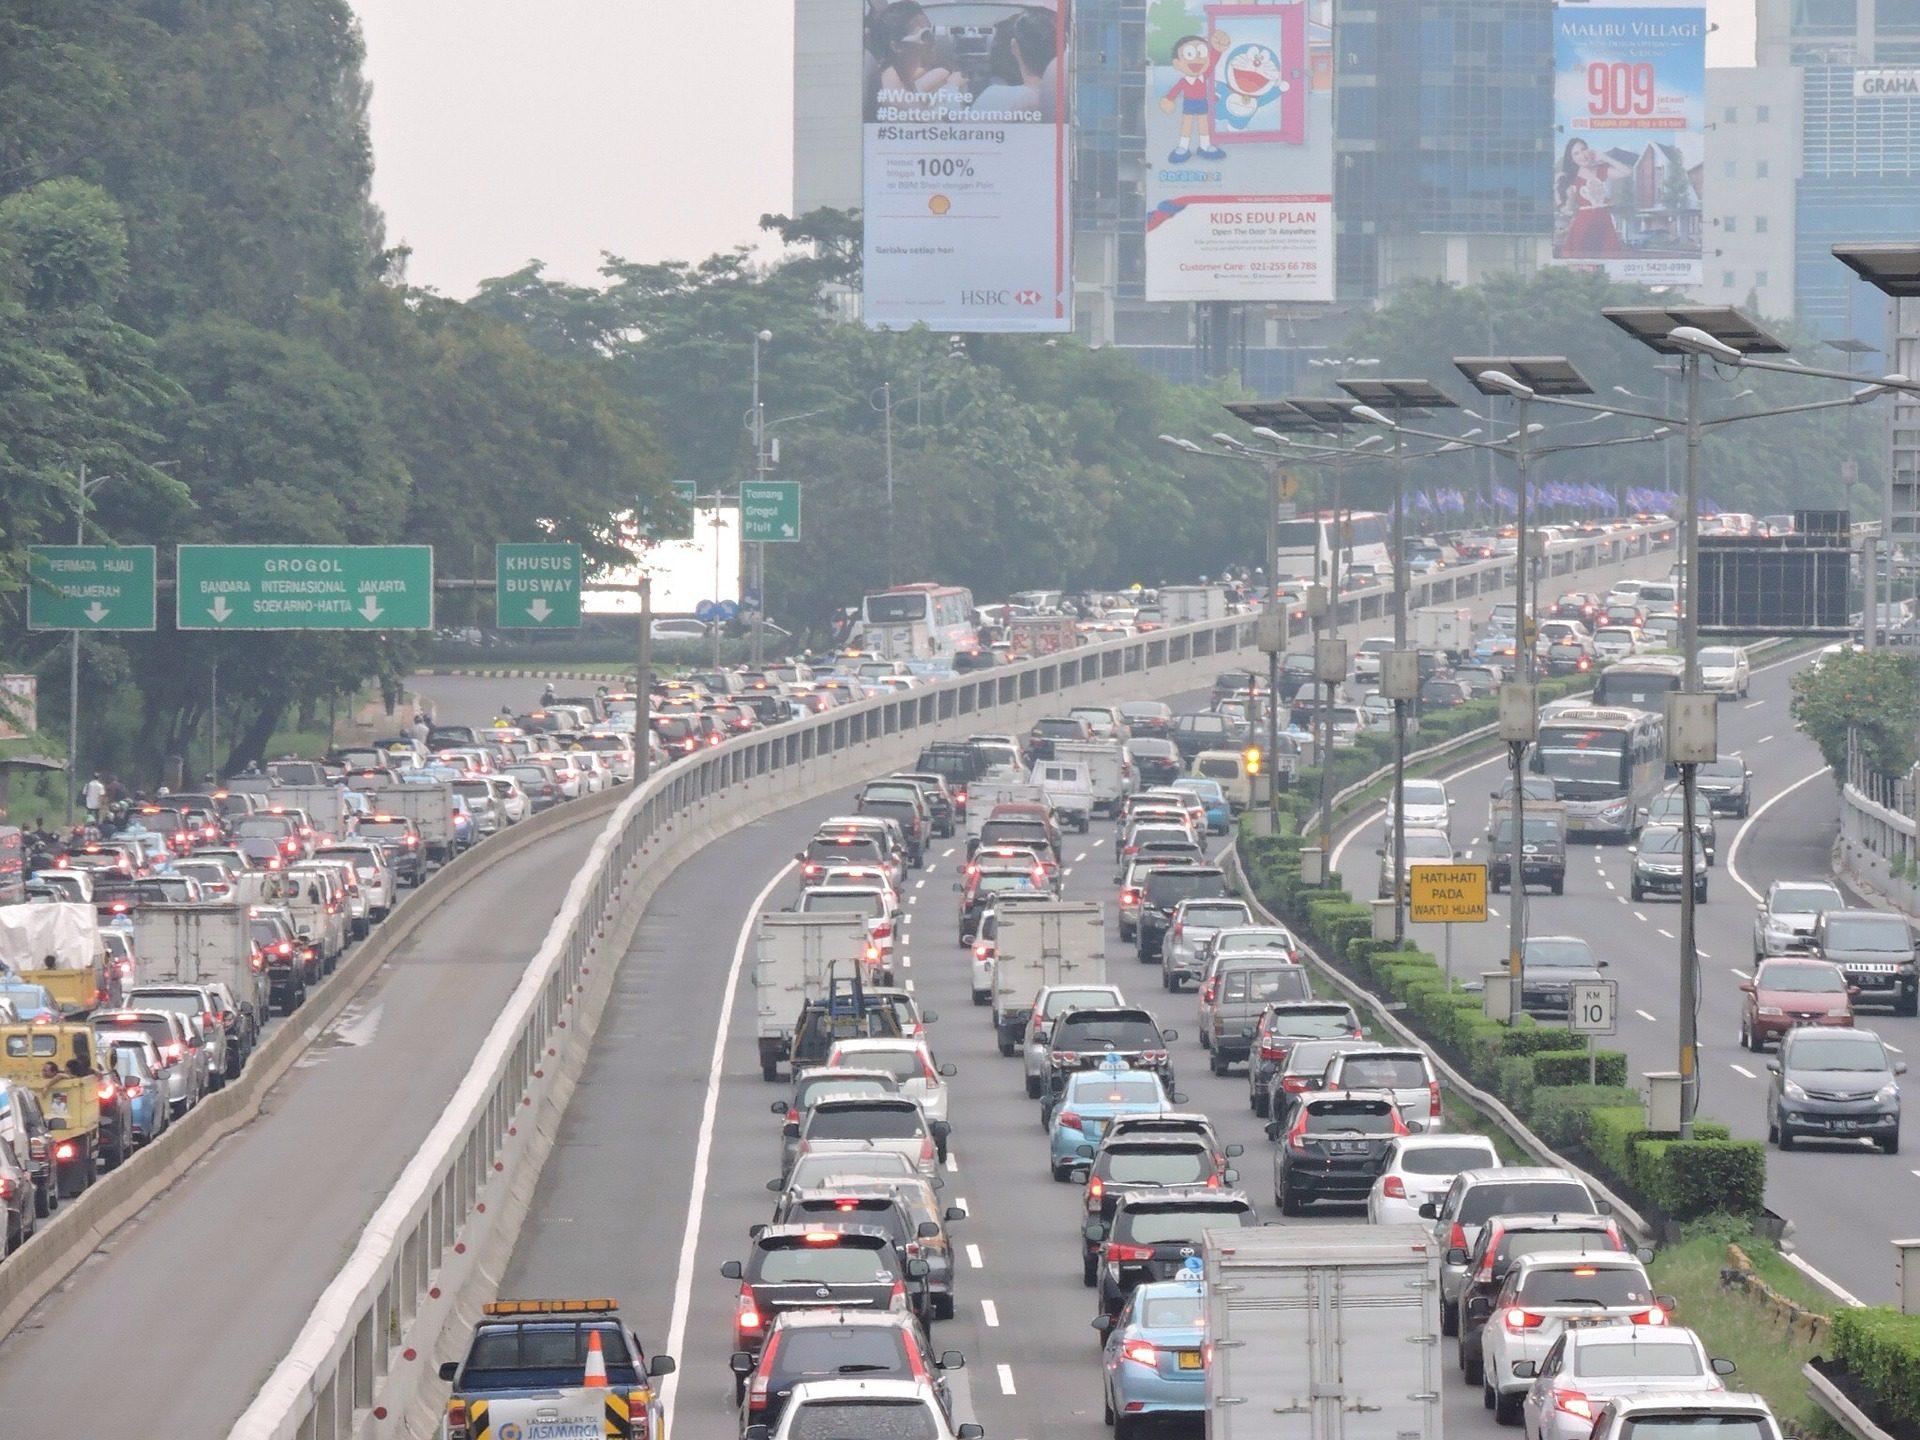 यातायात, जाम, colas, प्रदूषण, शहर, ढेर - HD वॉलपेपर - प्रोफेसर-falken.com